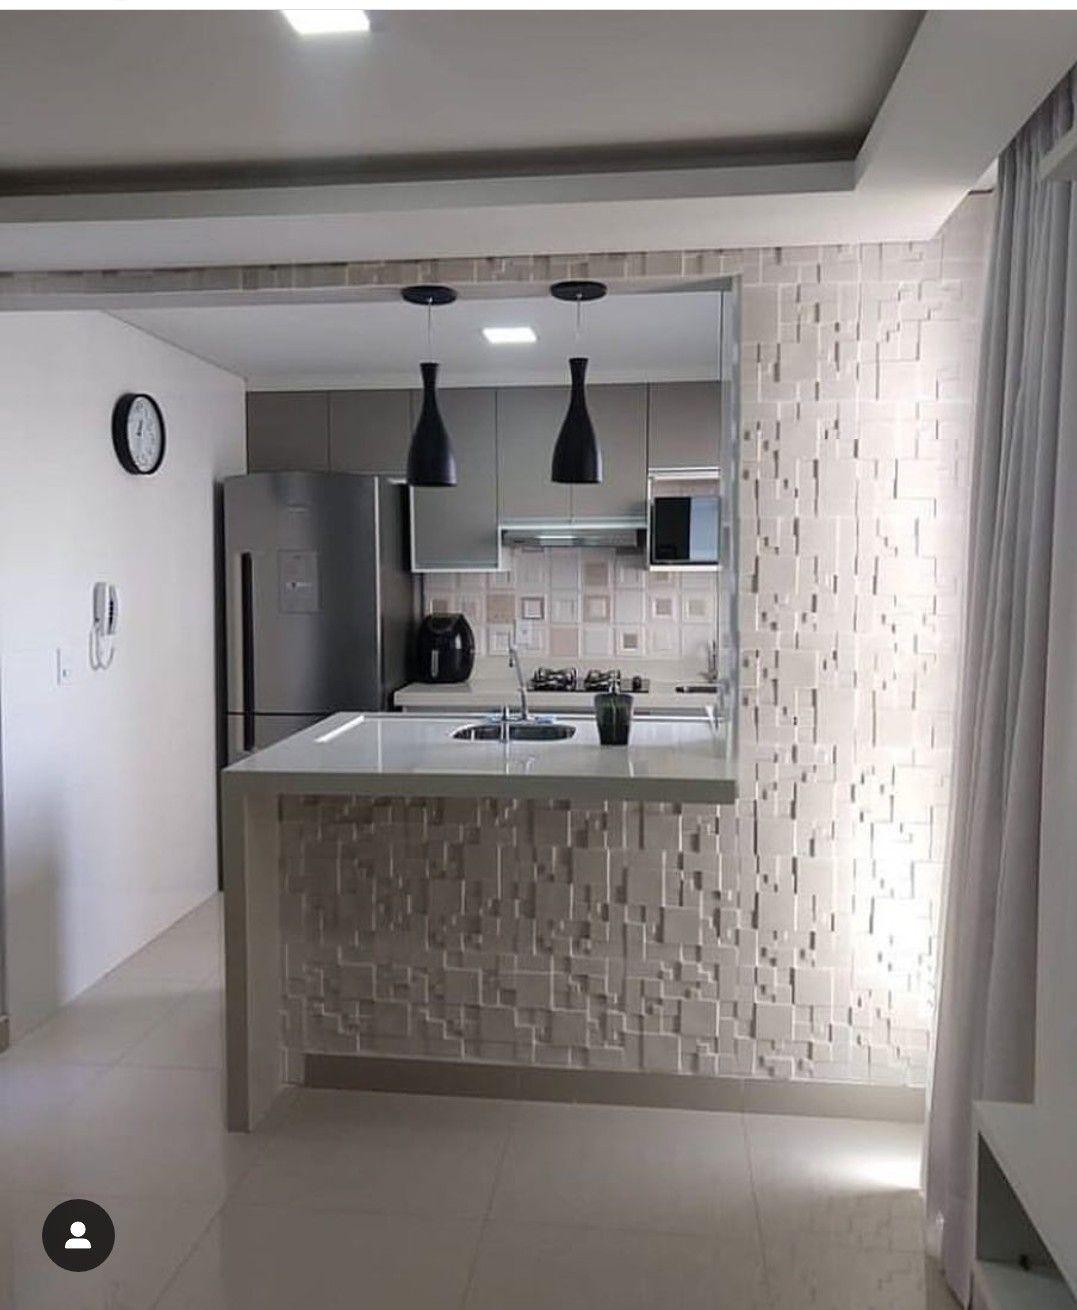 Imagen De Tejaswini Gopisetty En Kitchen En 2020 Cocinas De Casa